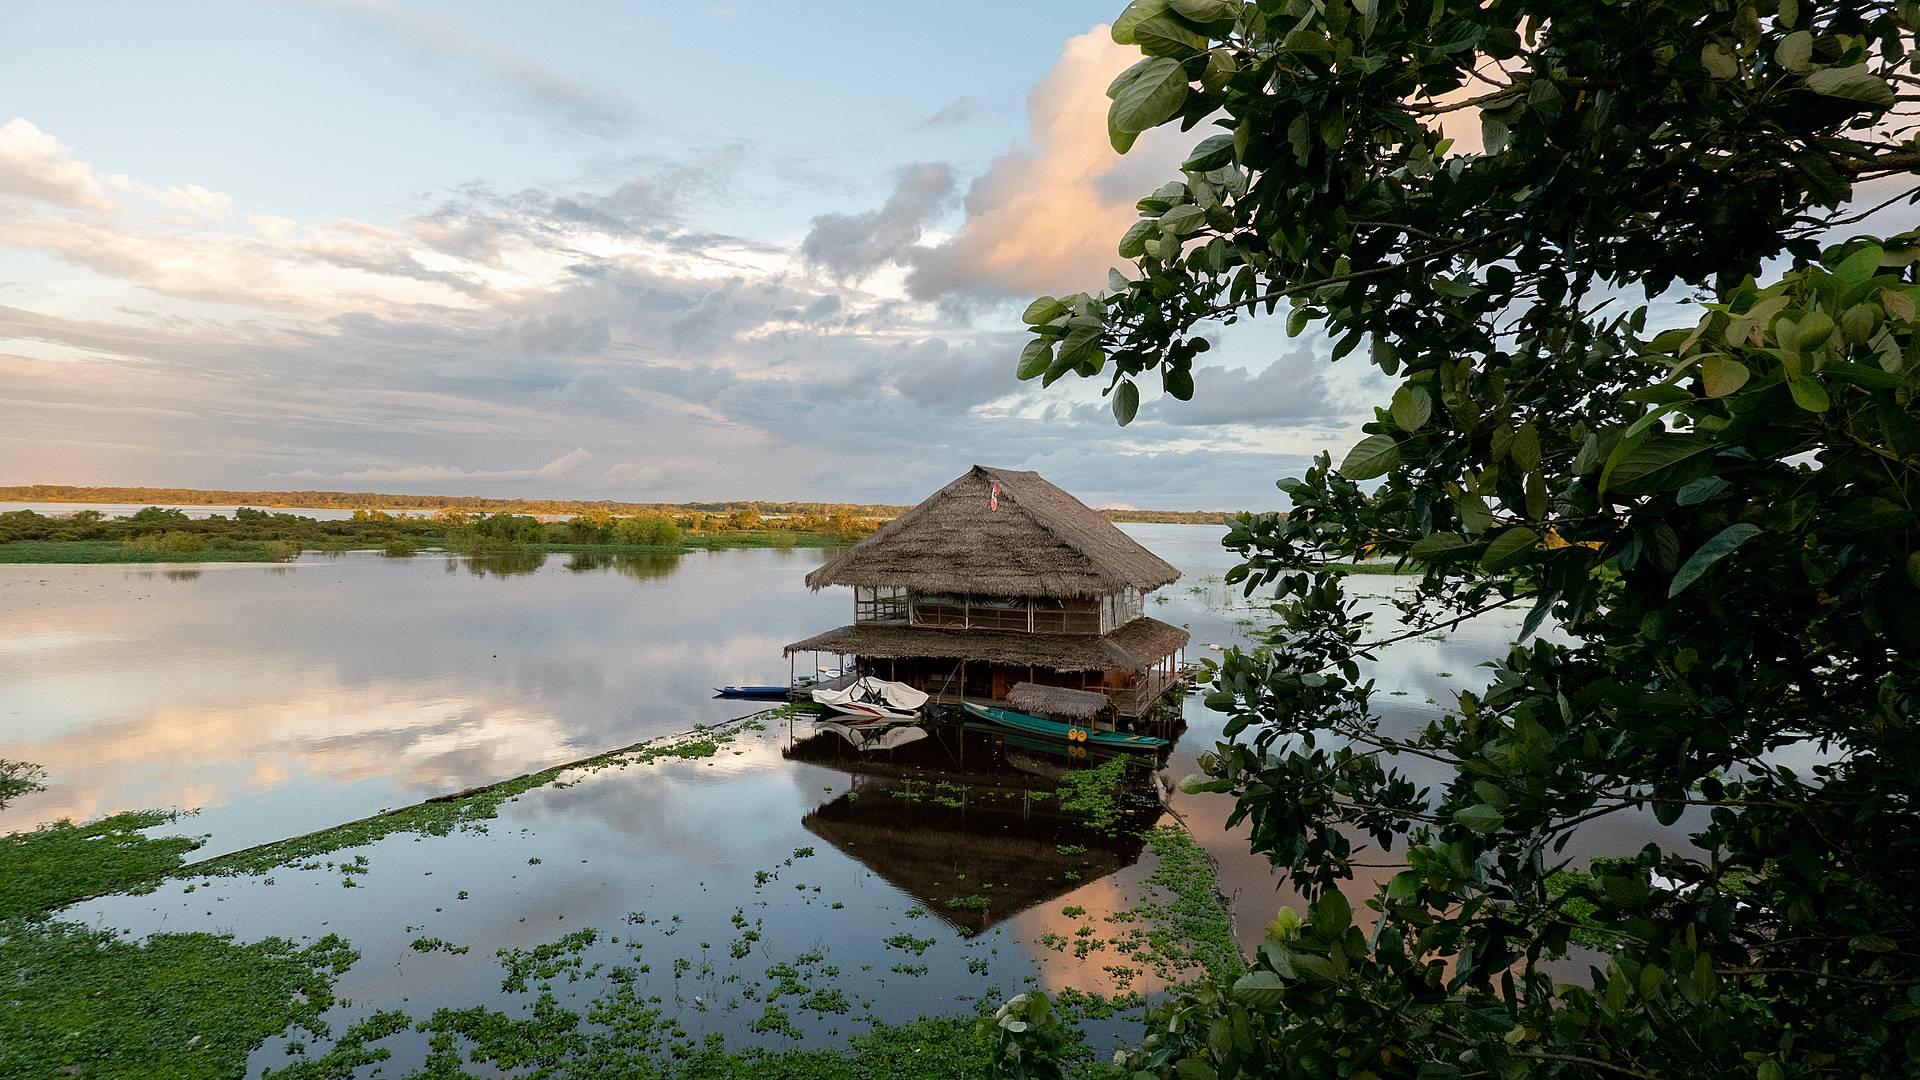 Avventura nell' Amazzonia peruviana, Machu Picchu e Luquina